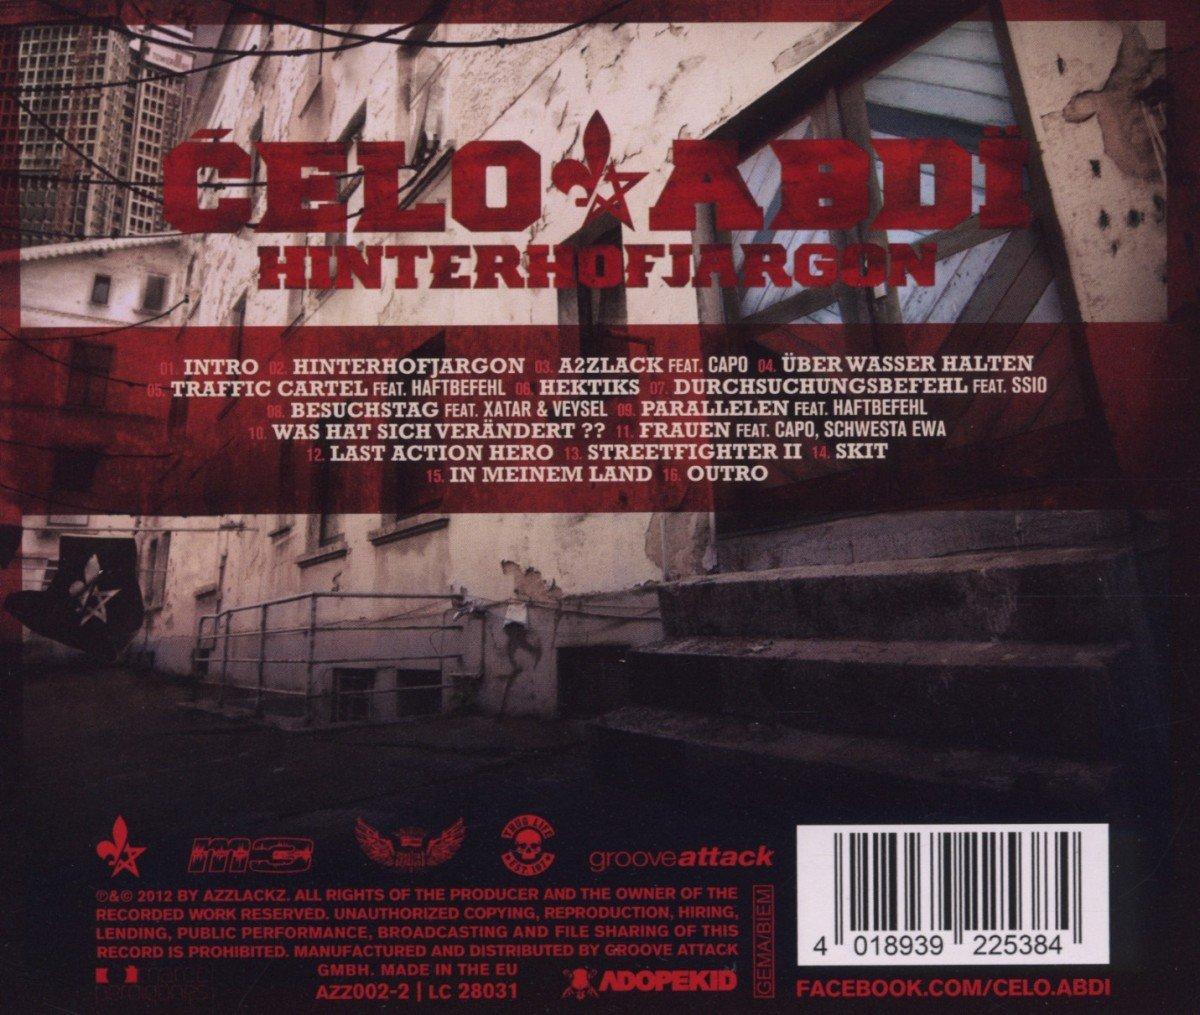 Celo & Abdi - Hinterhofjargon - Amazon.com Music